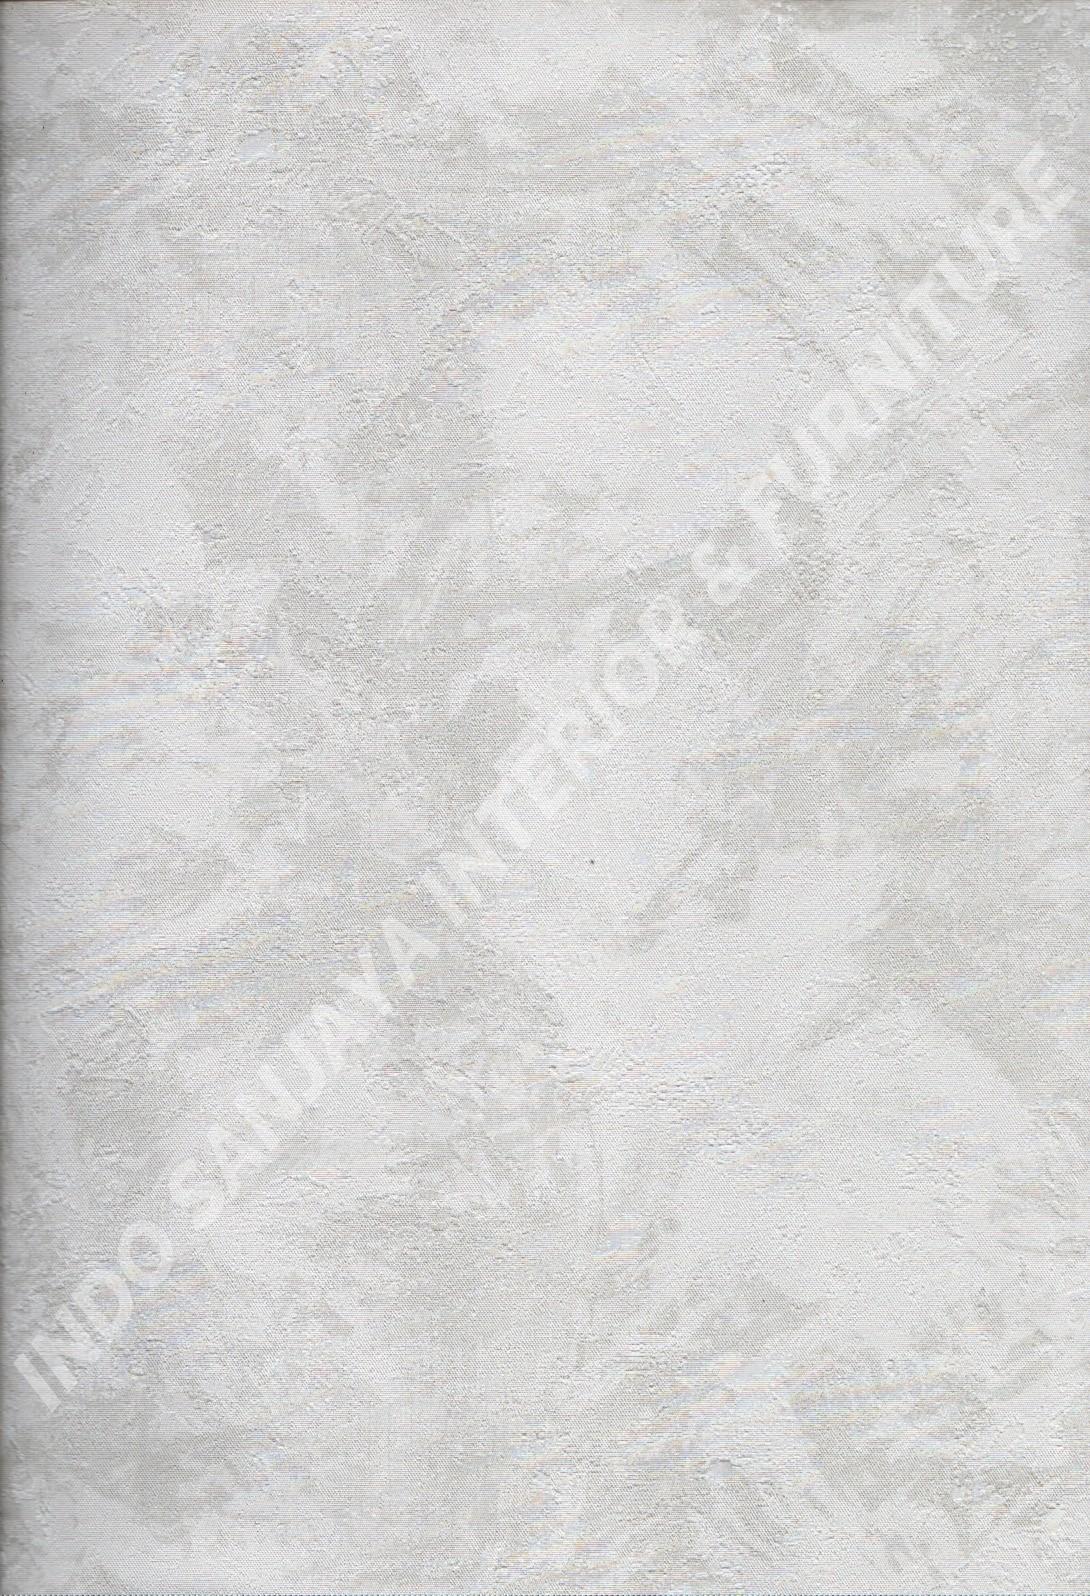 wallpaper   Wallpaper Minimalis Polos 81081-1:81081-1 corak  warna